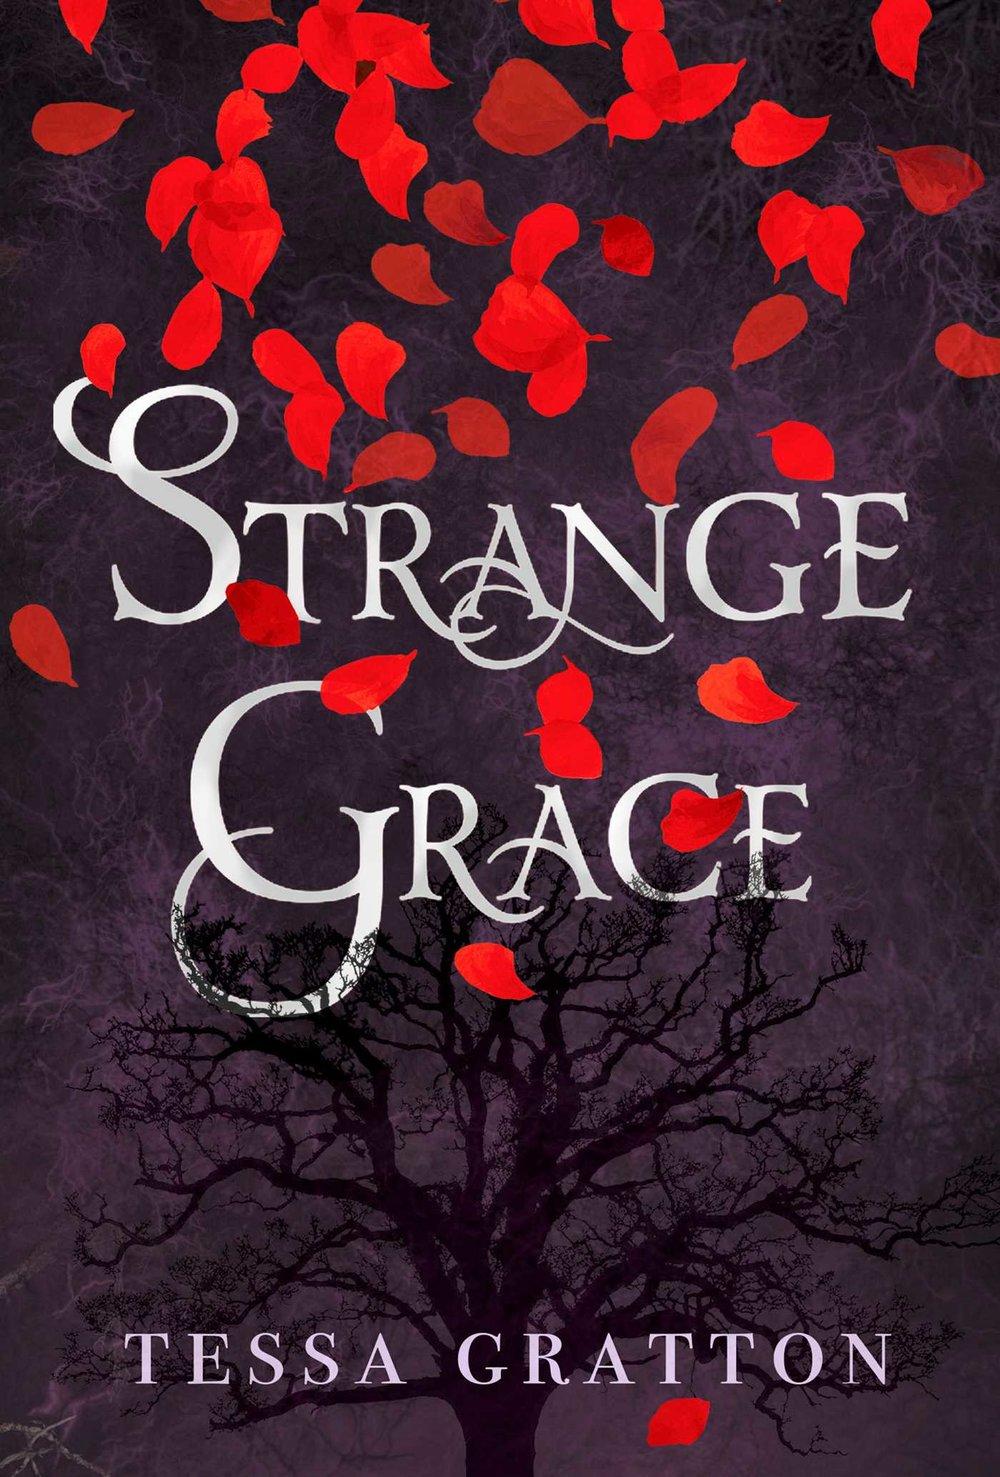 gratton-strange-grace.jpg